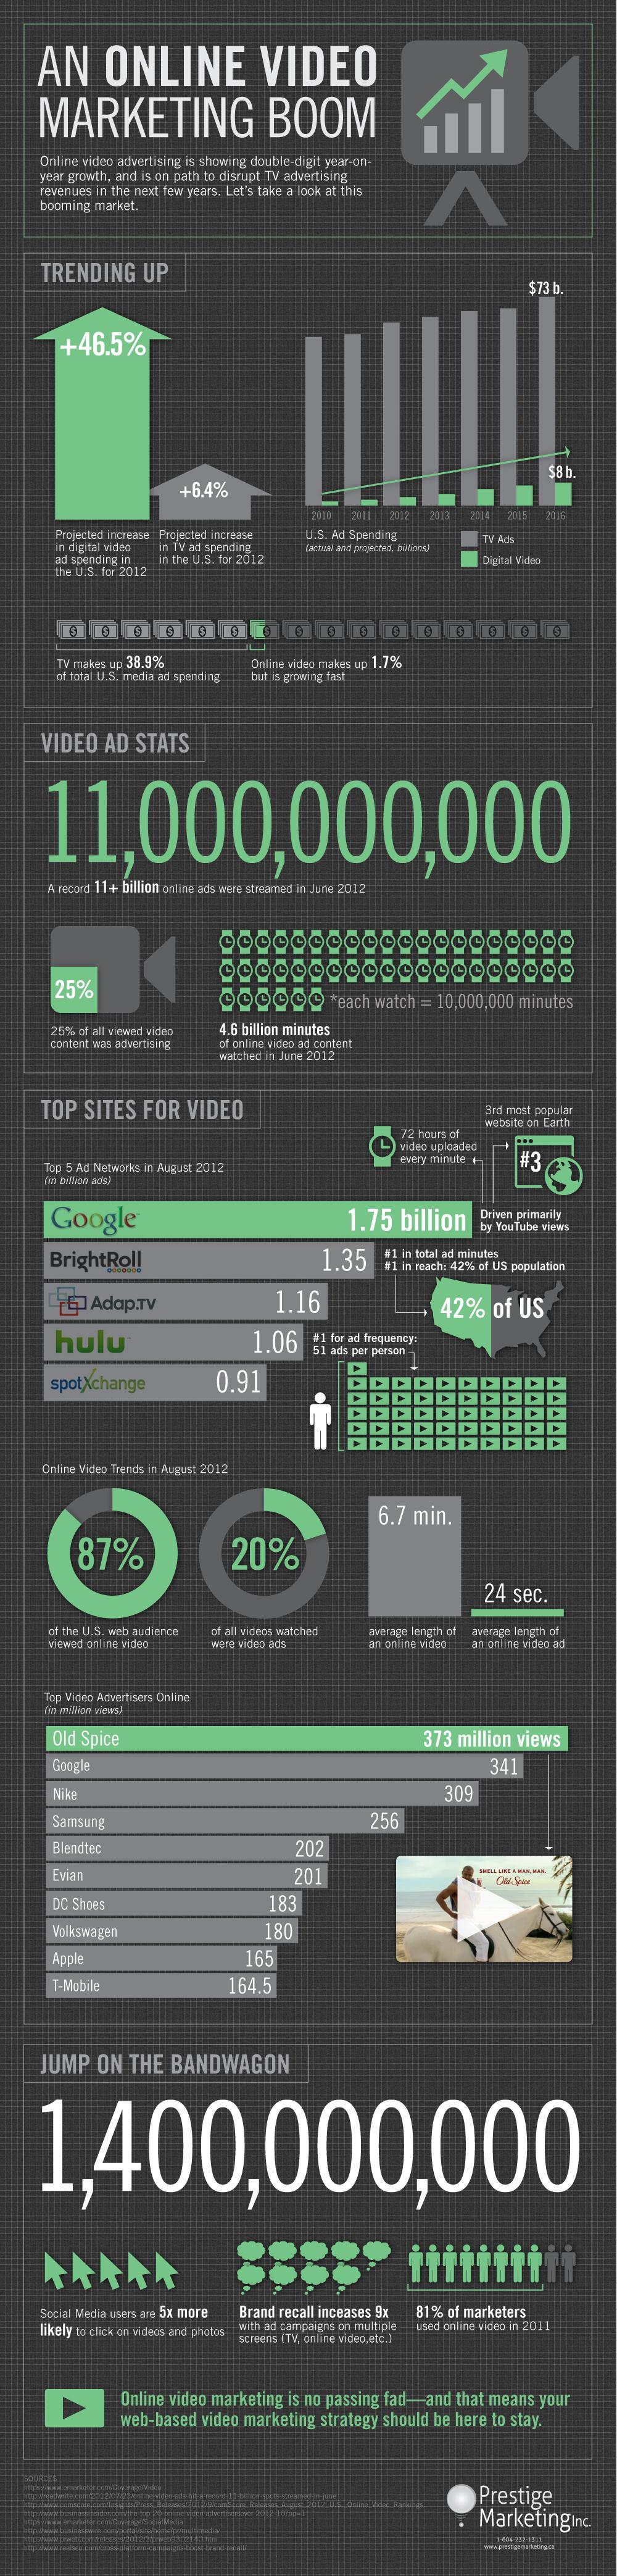 videomarketing_prestigemarketing